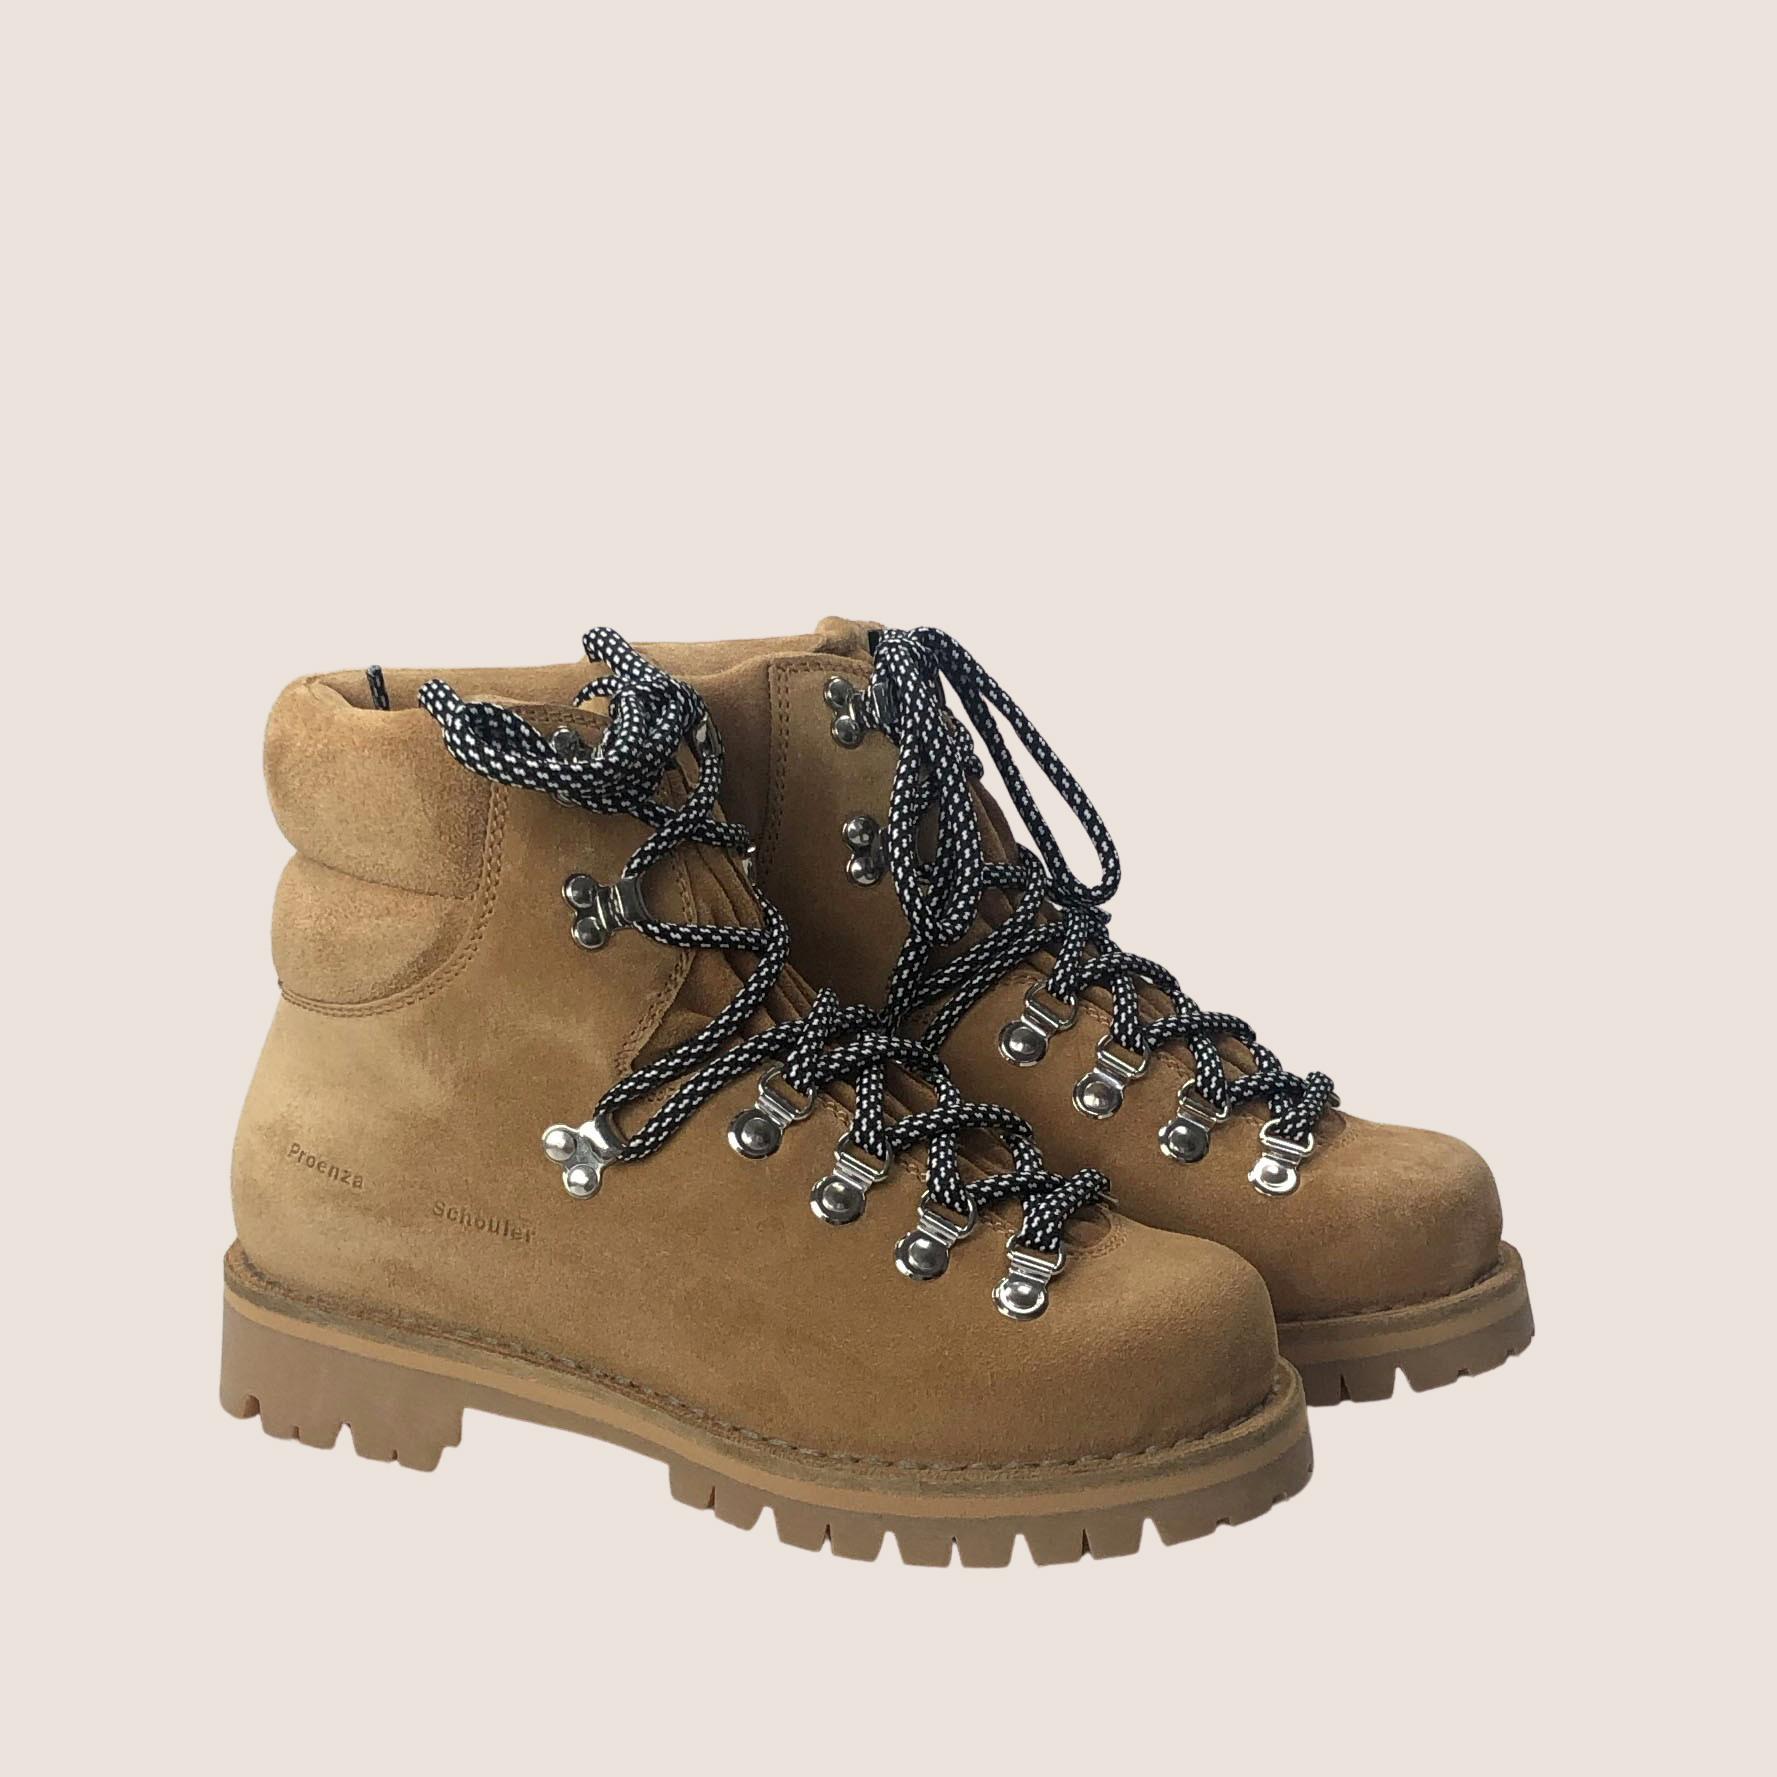 Crosta Boots